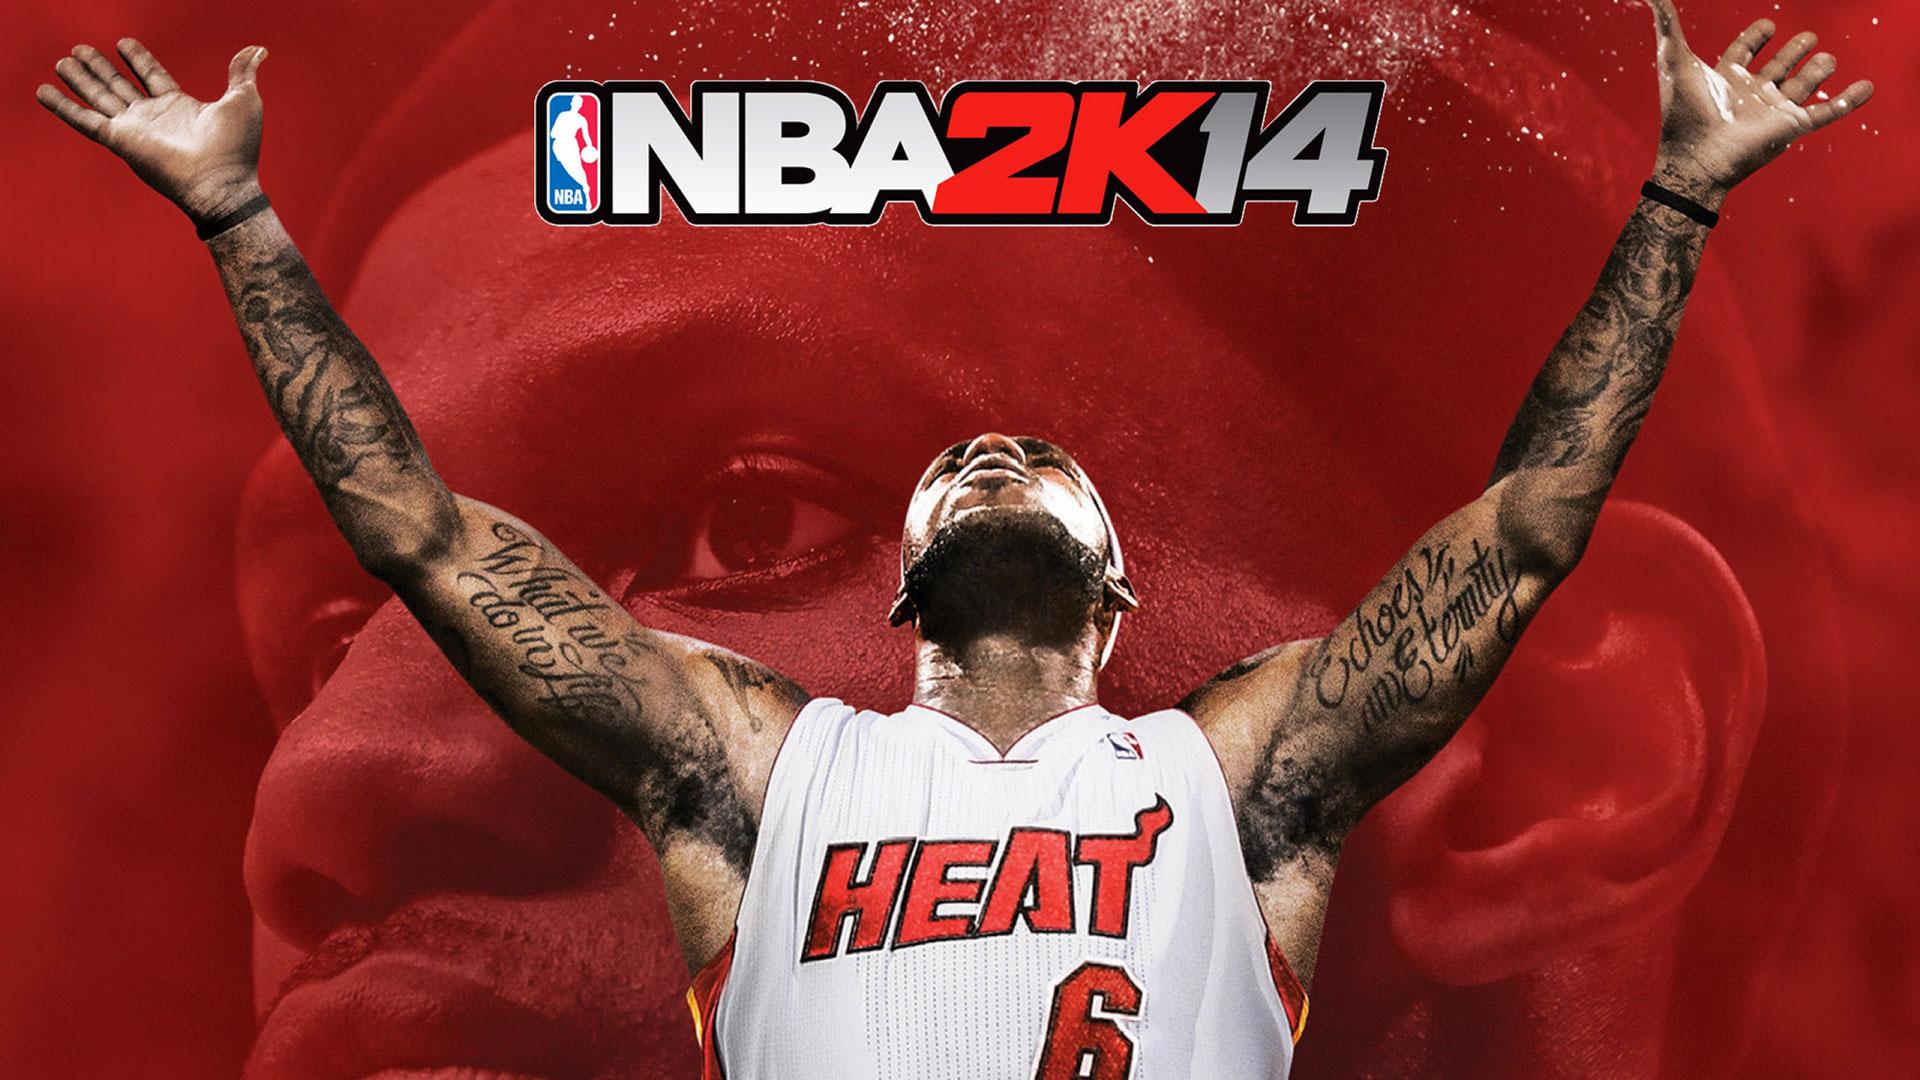 NBA 2K14 Xbox One, la recensione di XboxWay - XboxWay.com